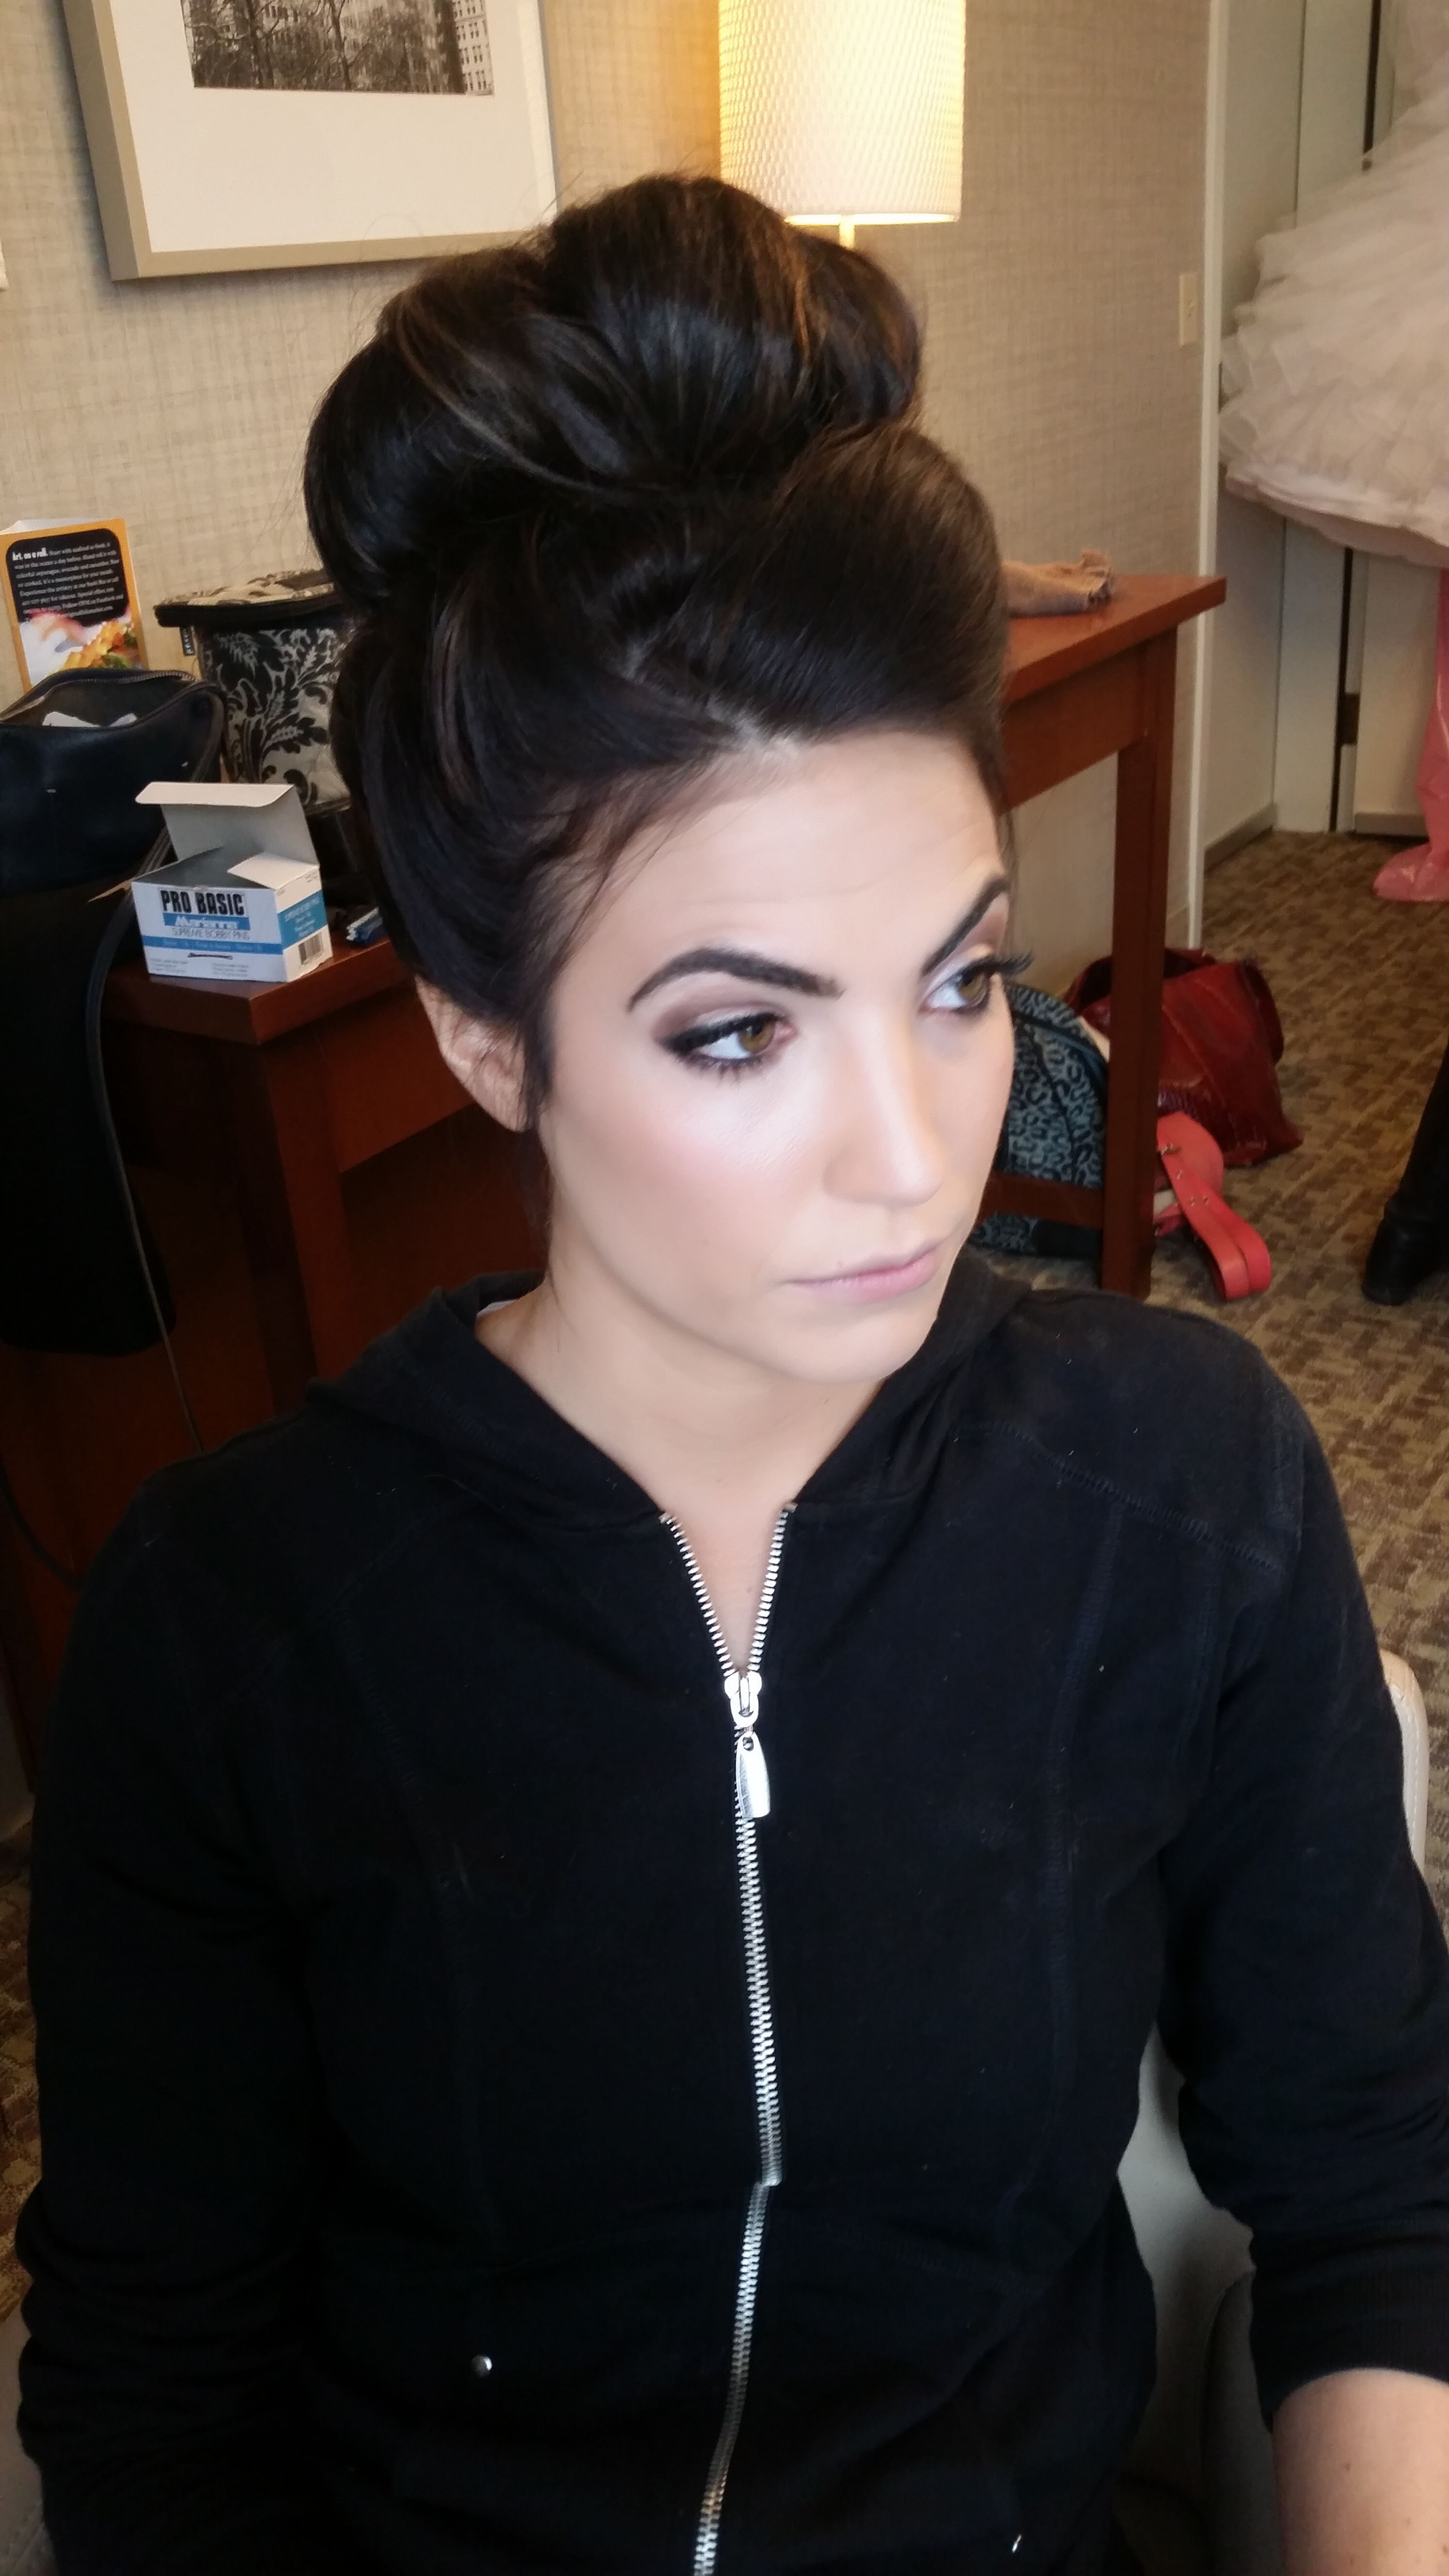 Wedding hair & makeup by Justine Lynn Pittsburgh Hair